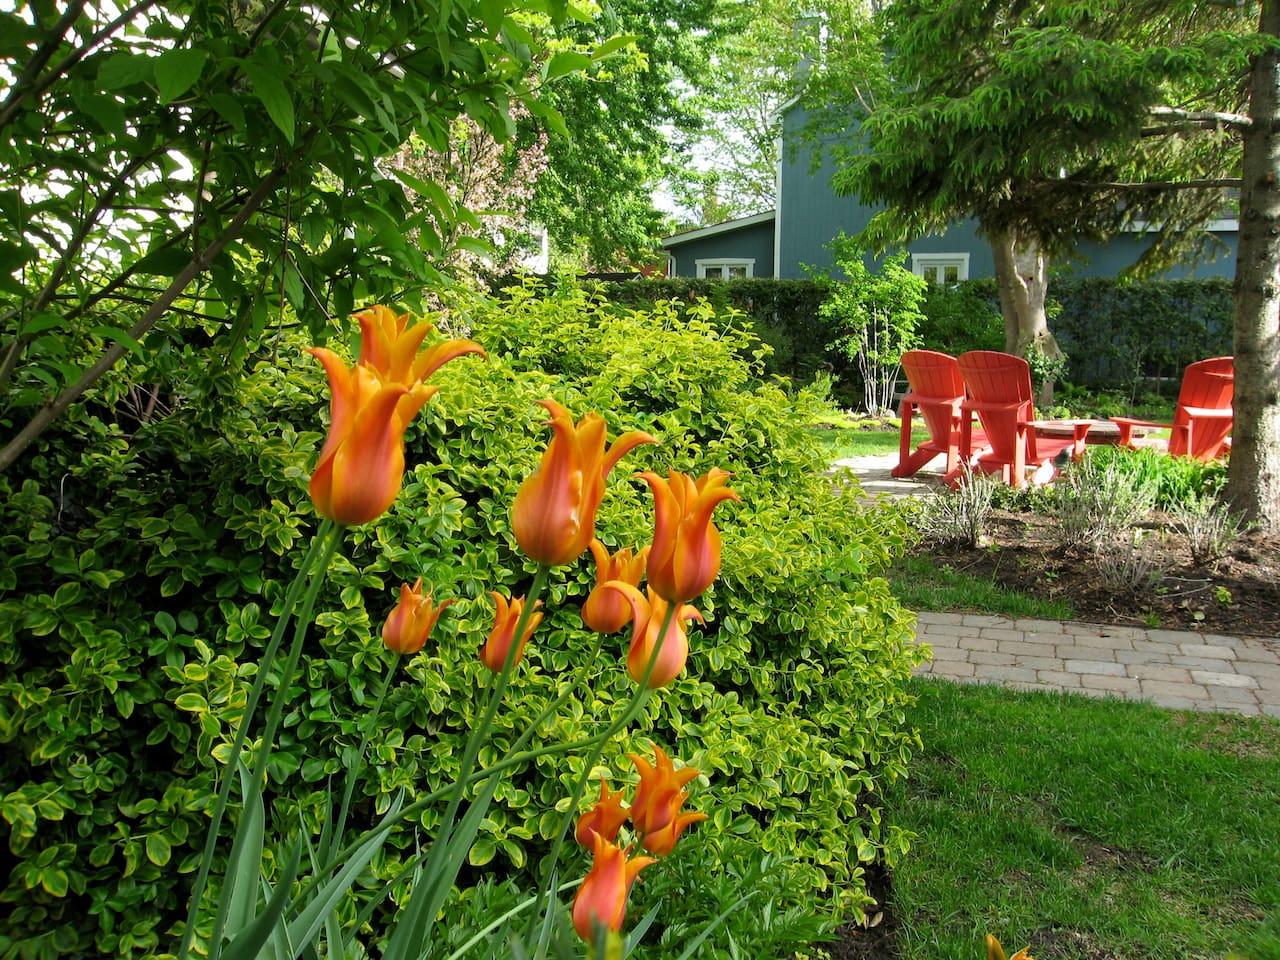 Spring time in the garden